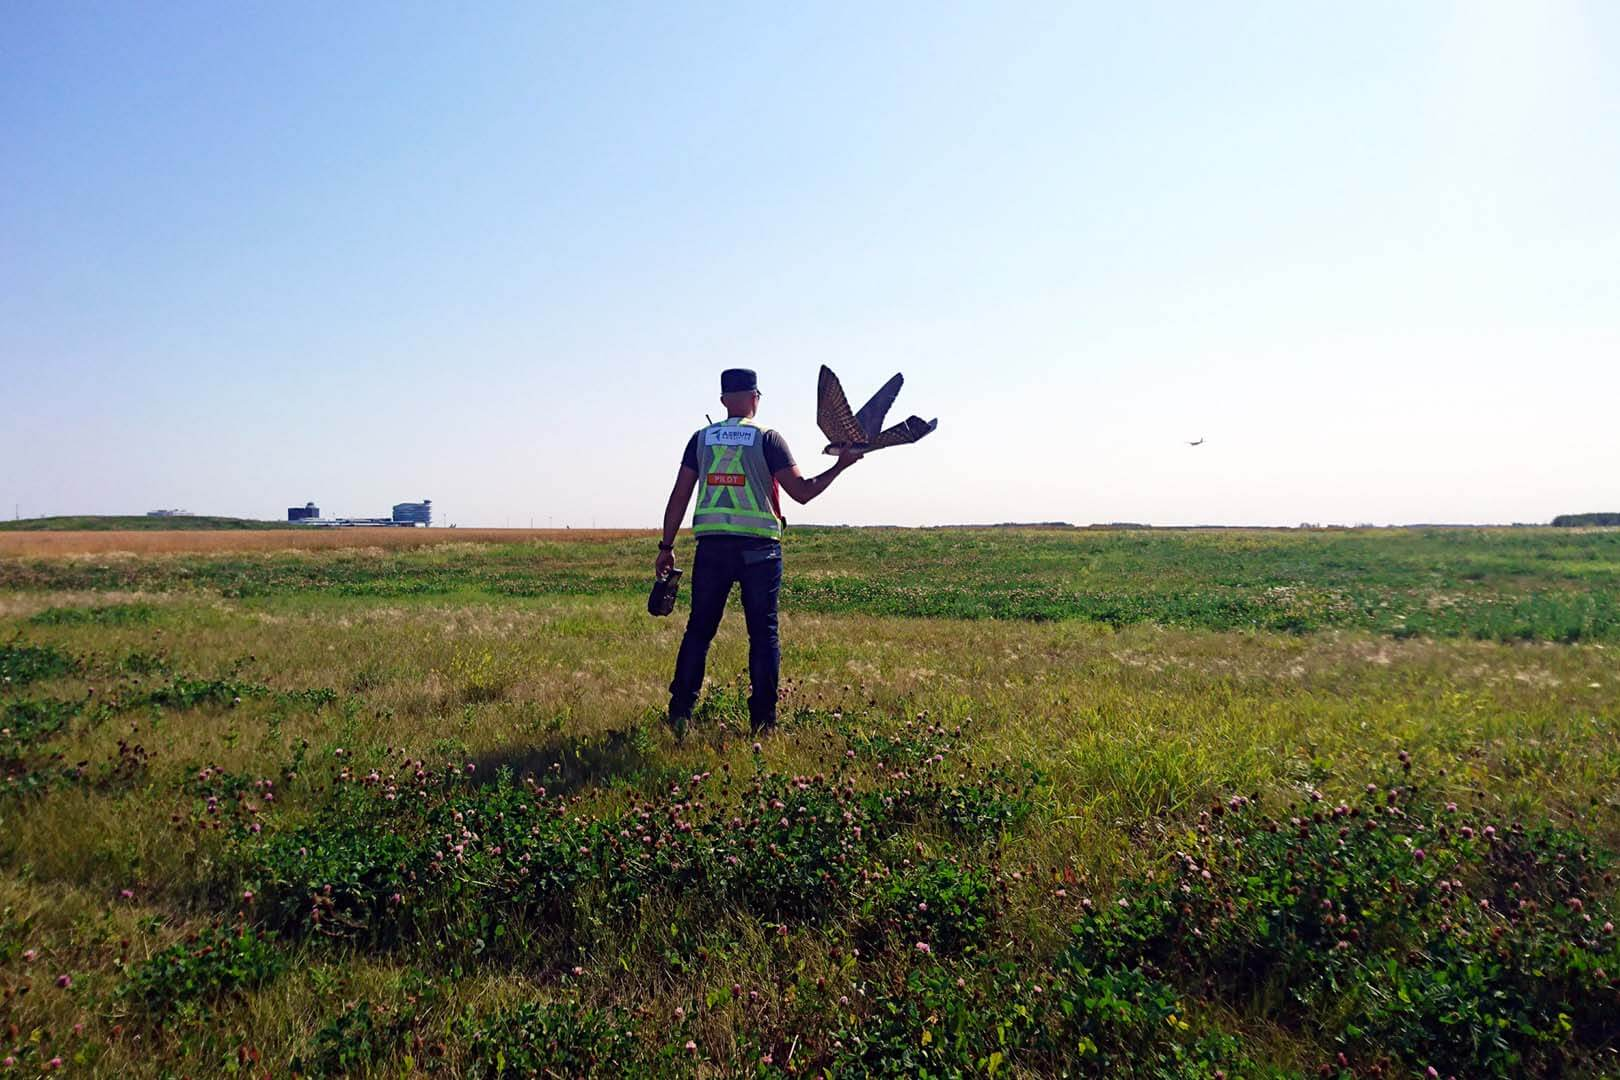 The Drone Bird wildlife management at Edmonton International Airport